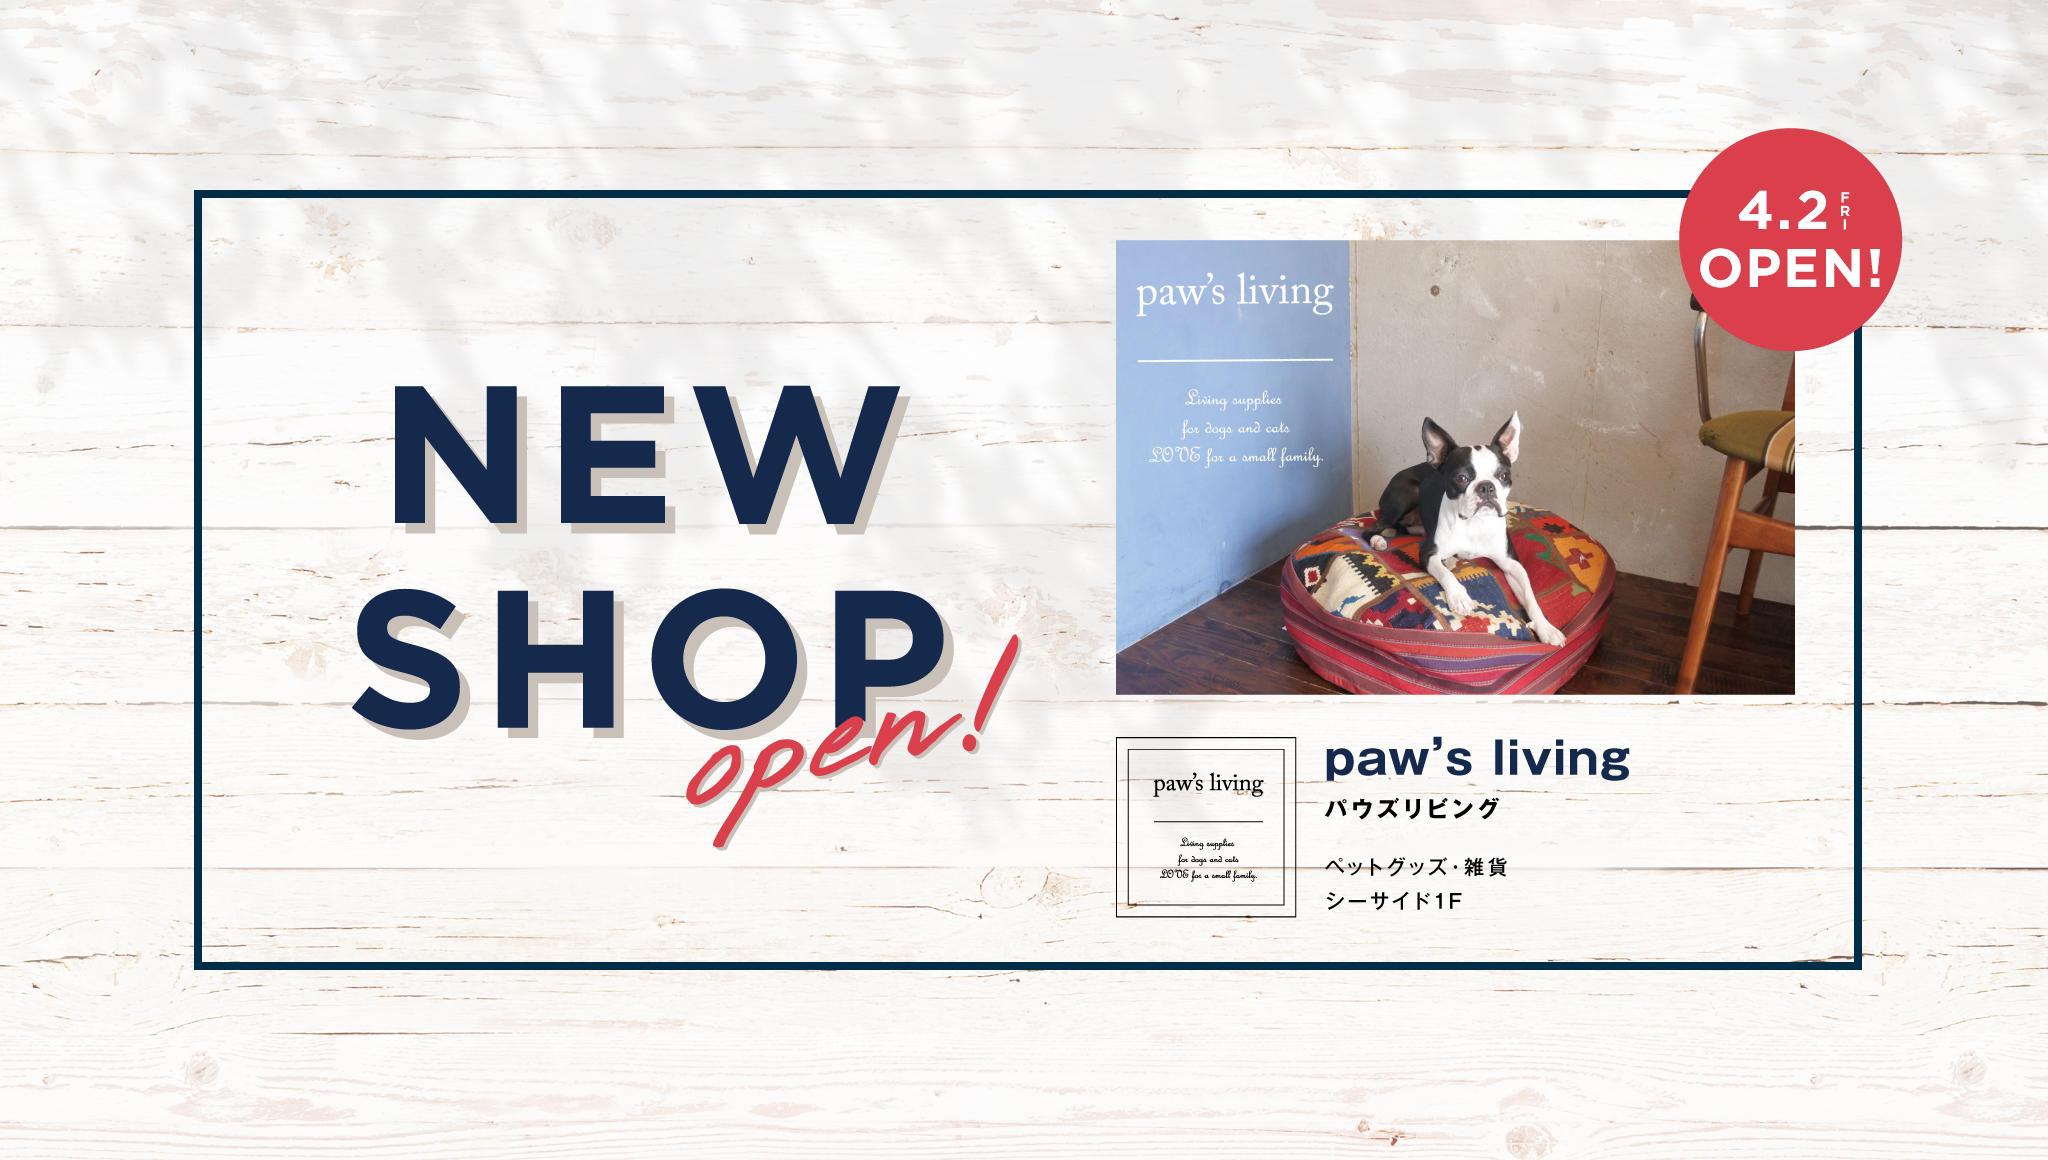 NEW SHOP 『paw's living』 4/2(fri) OPEN!!